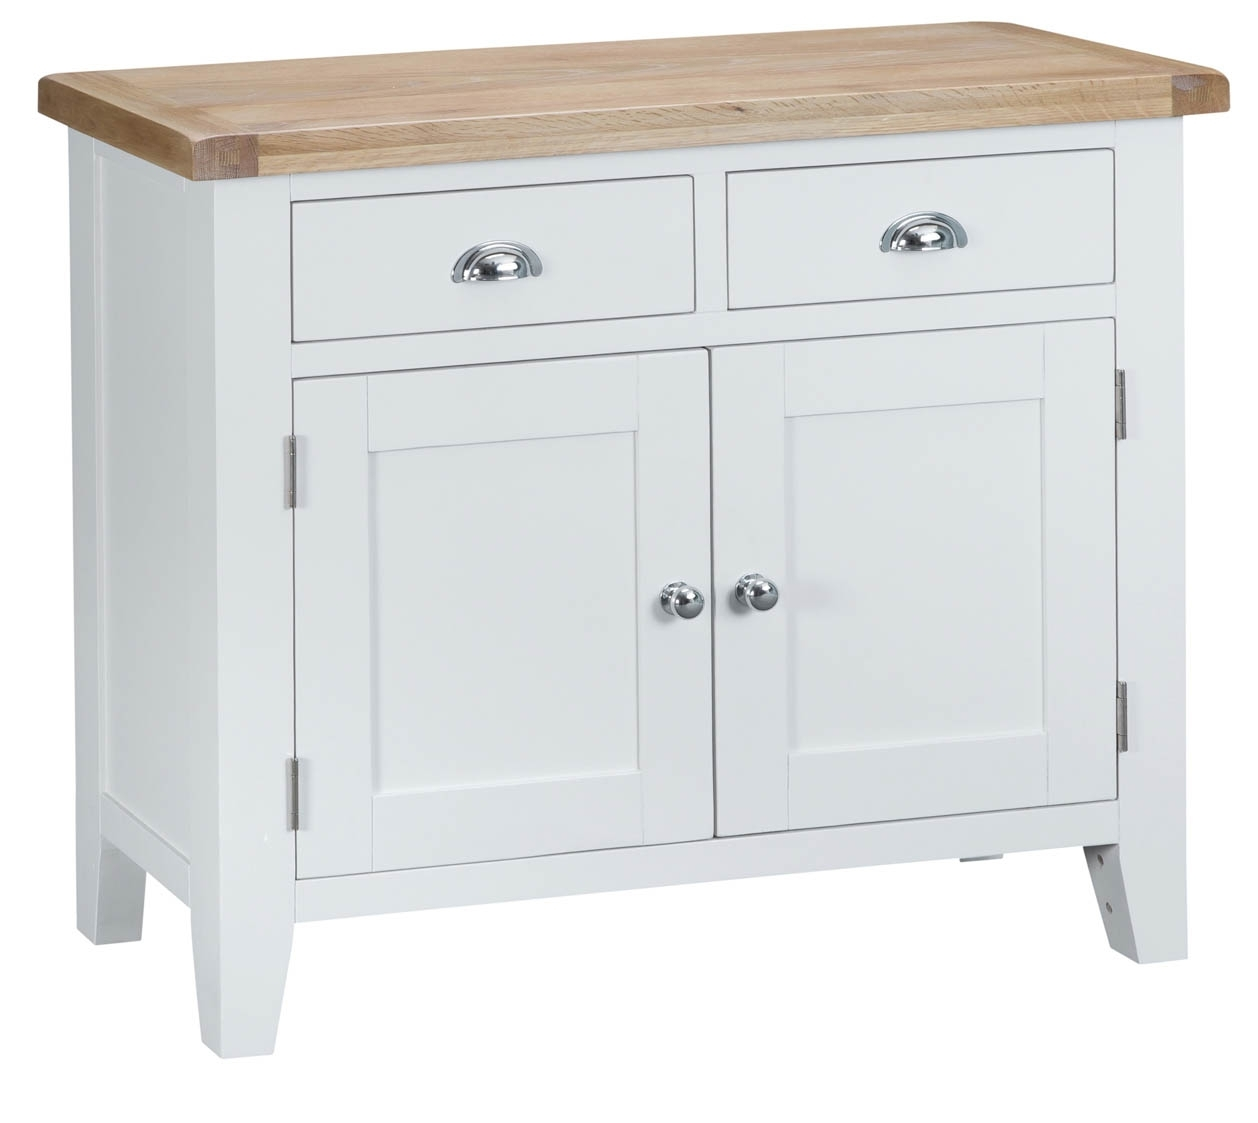 Woodbridge 2 Door White Sideboard | Fully Assembled | Oak World Regarding Recent 2 Door White Wash Sideboards (View 9 of 20)